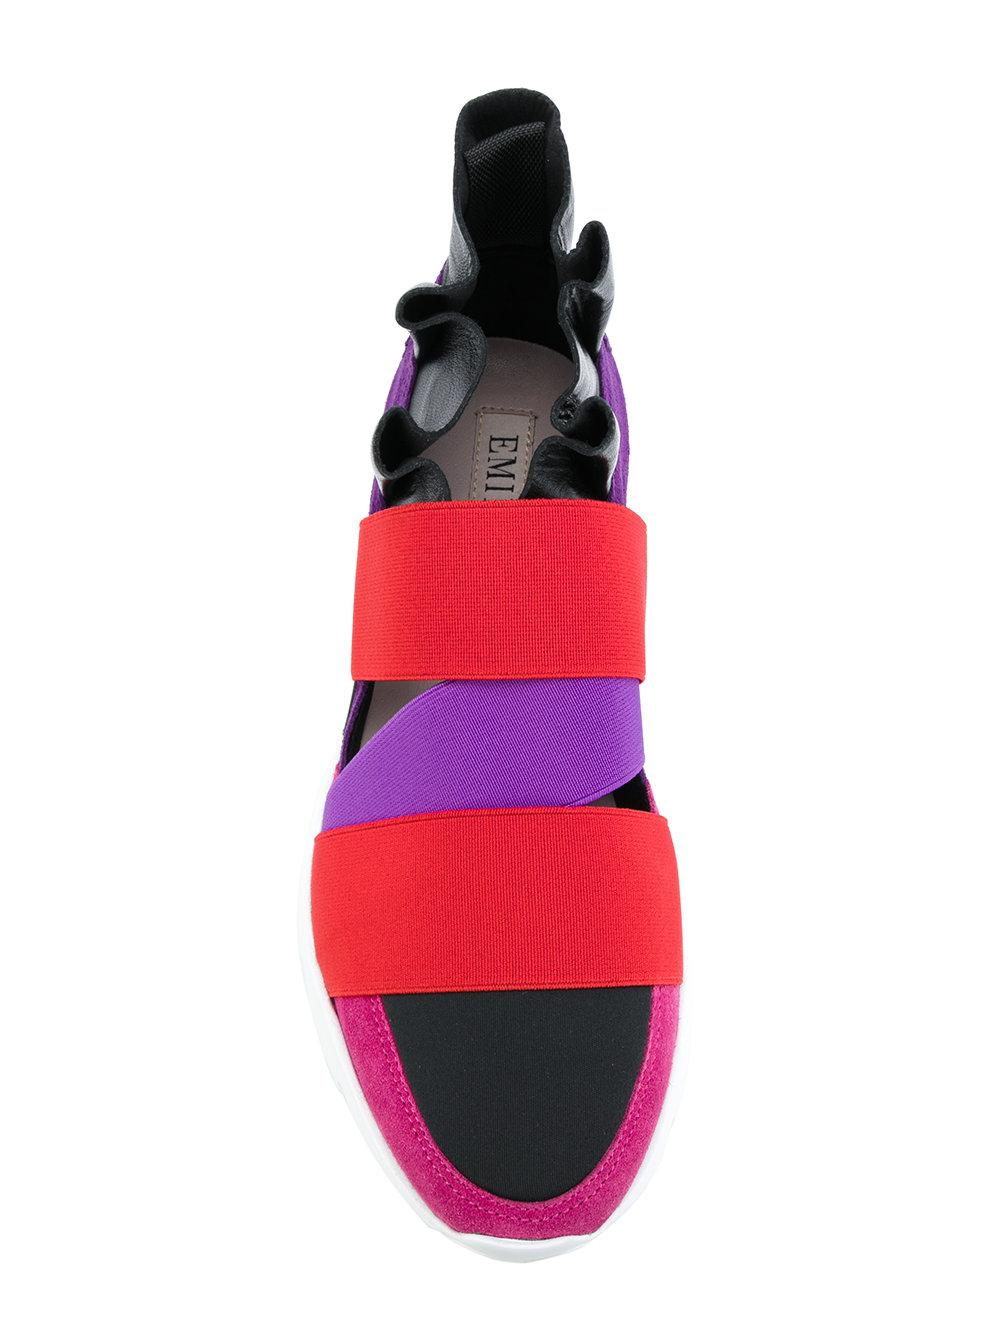 Emilio Pucci Suede Strap Slip-on Sneakers